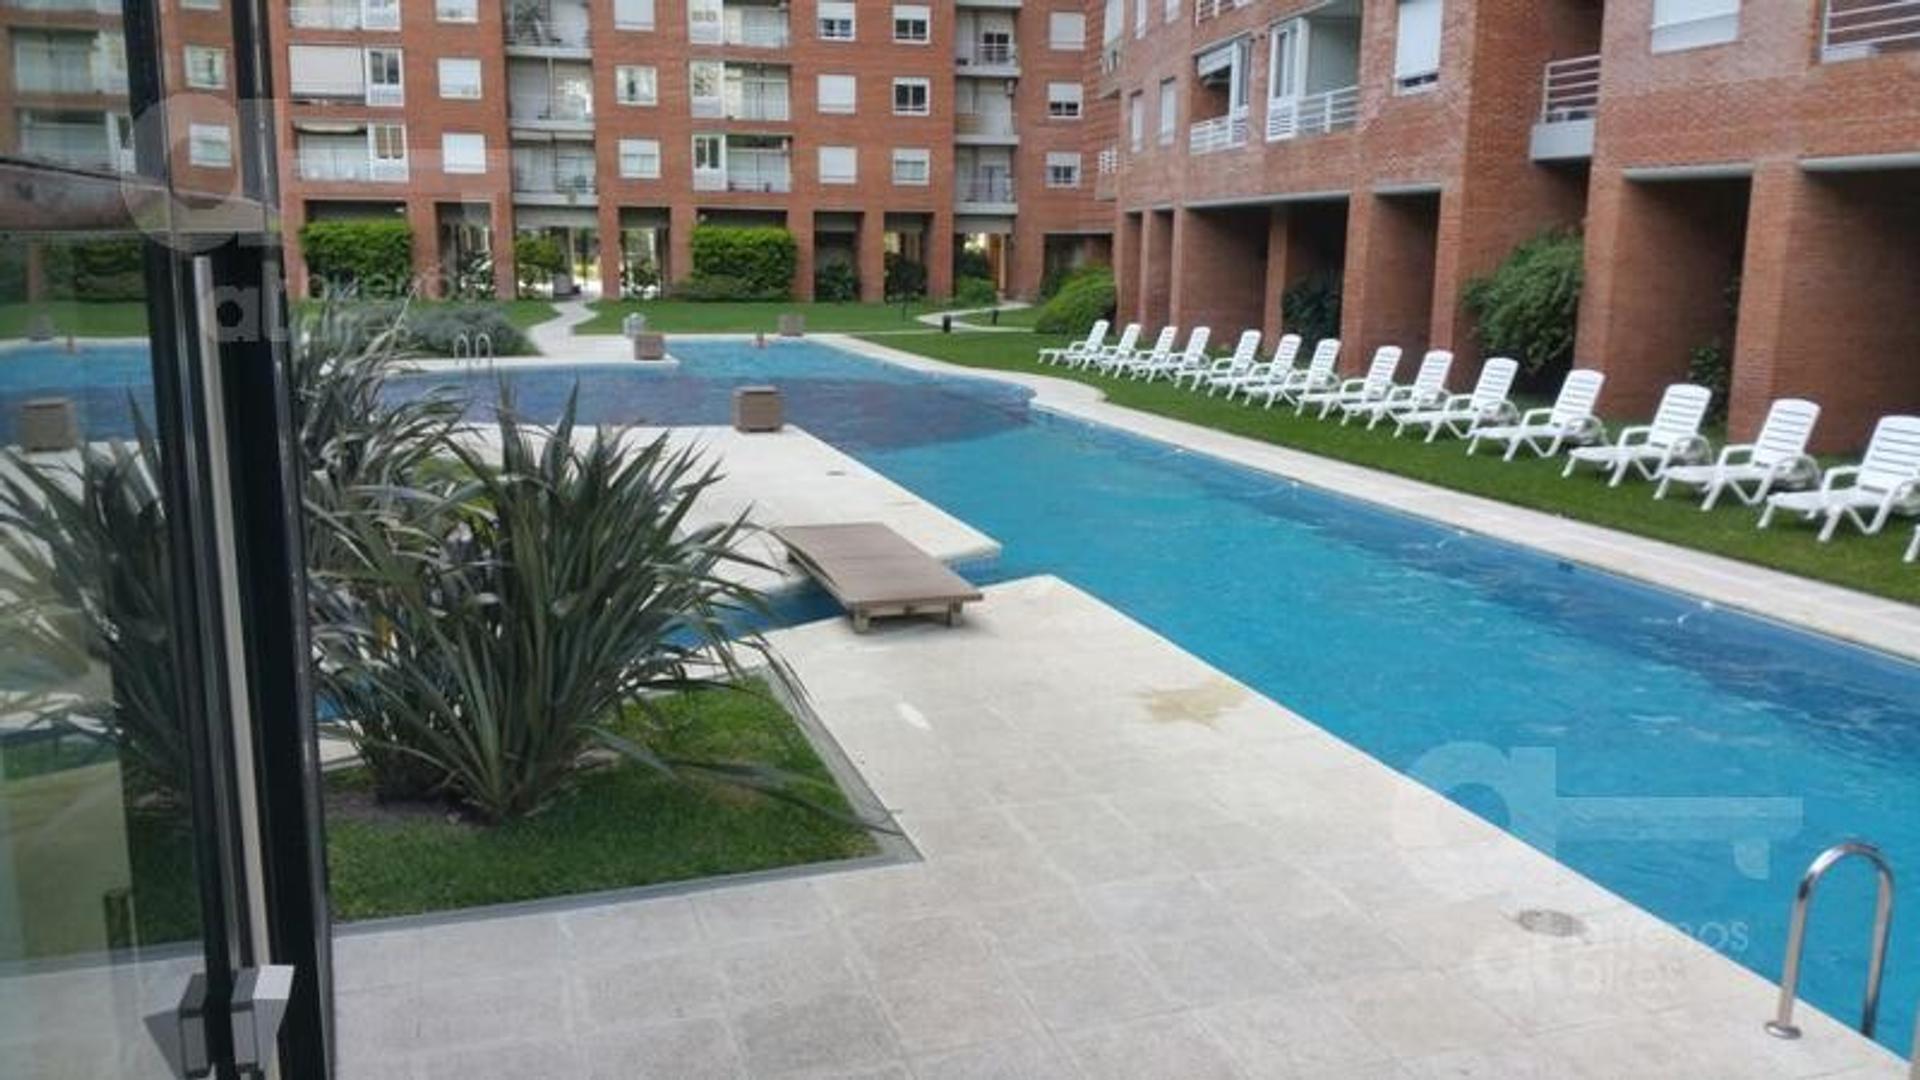 Nuñez. Departamento 2 ambientes con balcón. Alquiler temporario sin garantías.